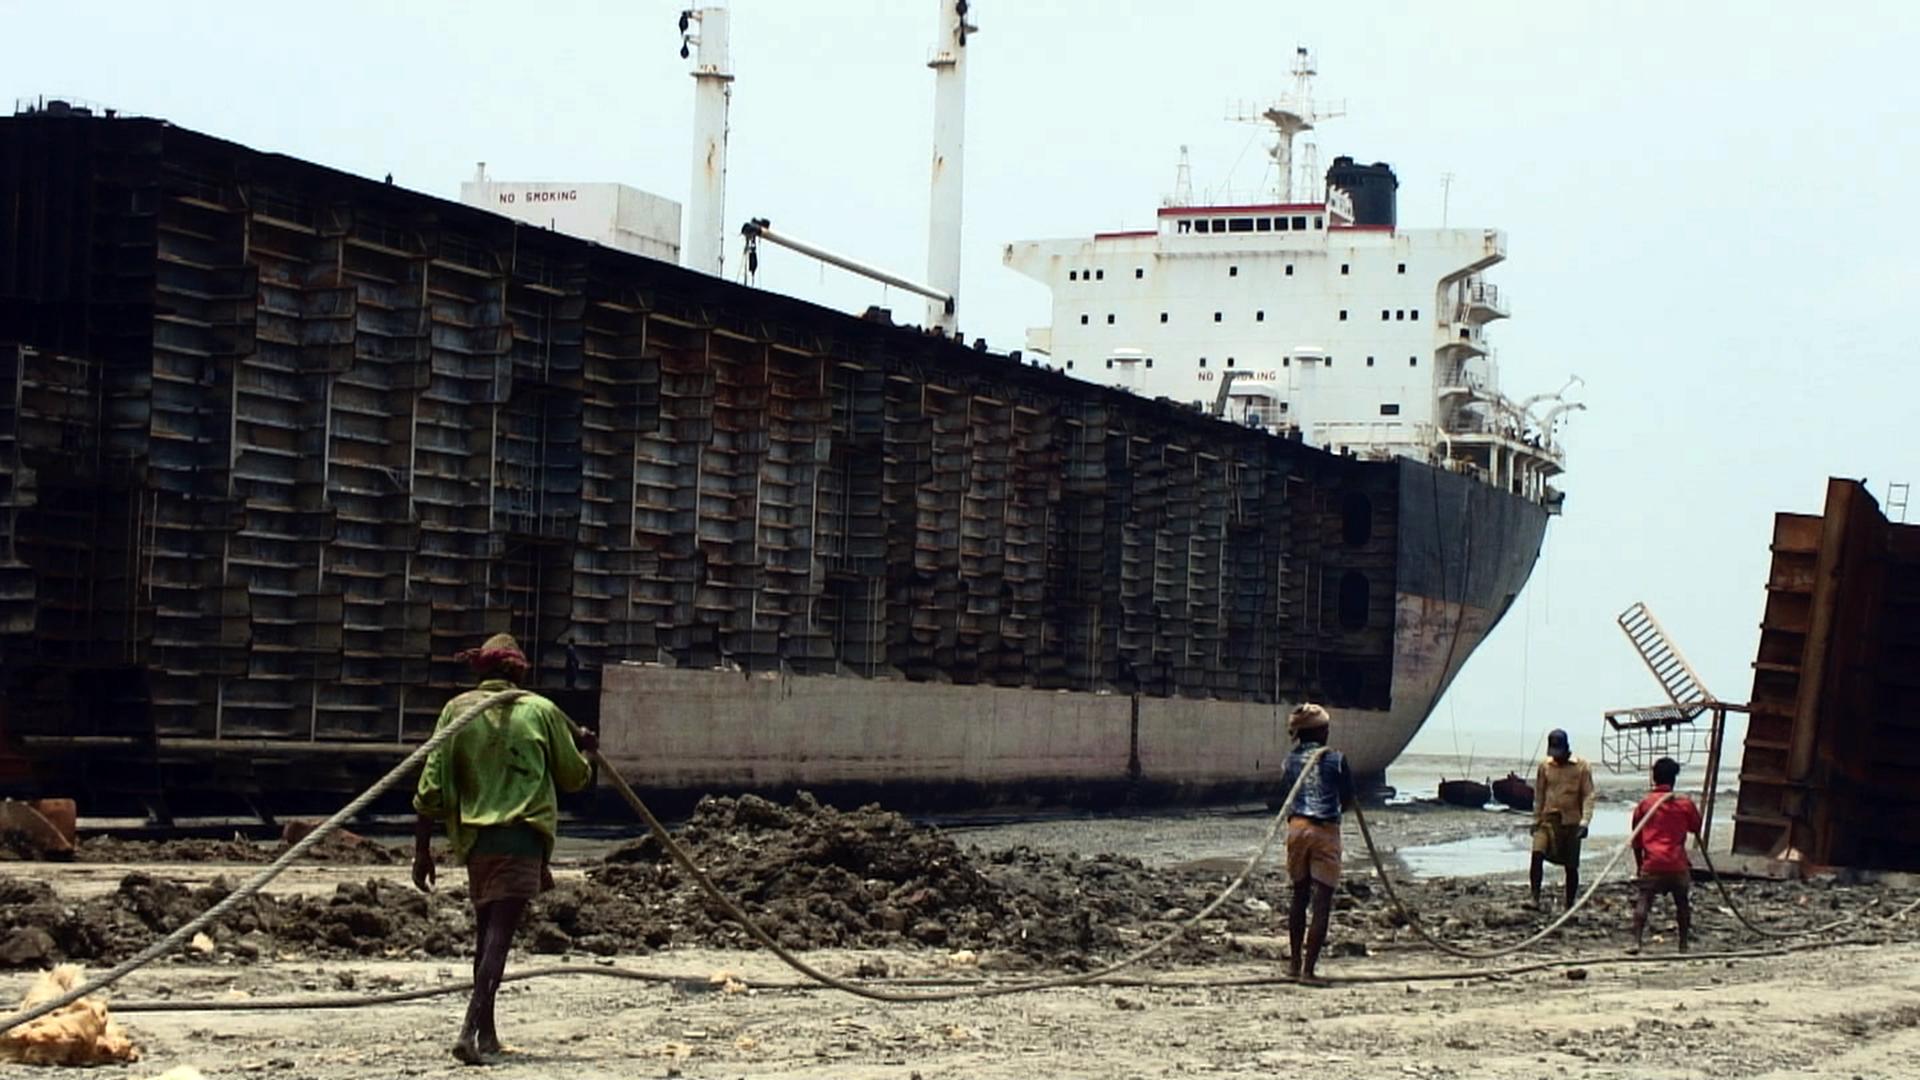 Jafrabad_Chittagong_shipbreaking_(8)